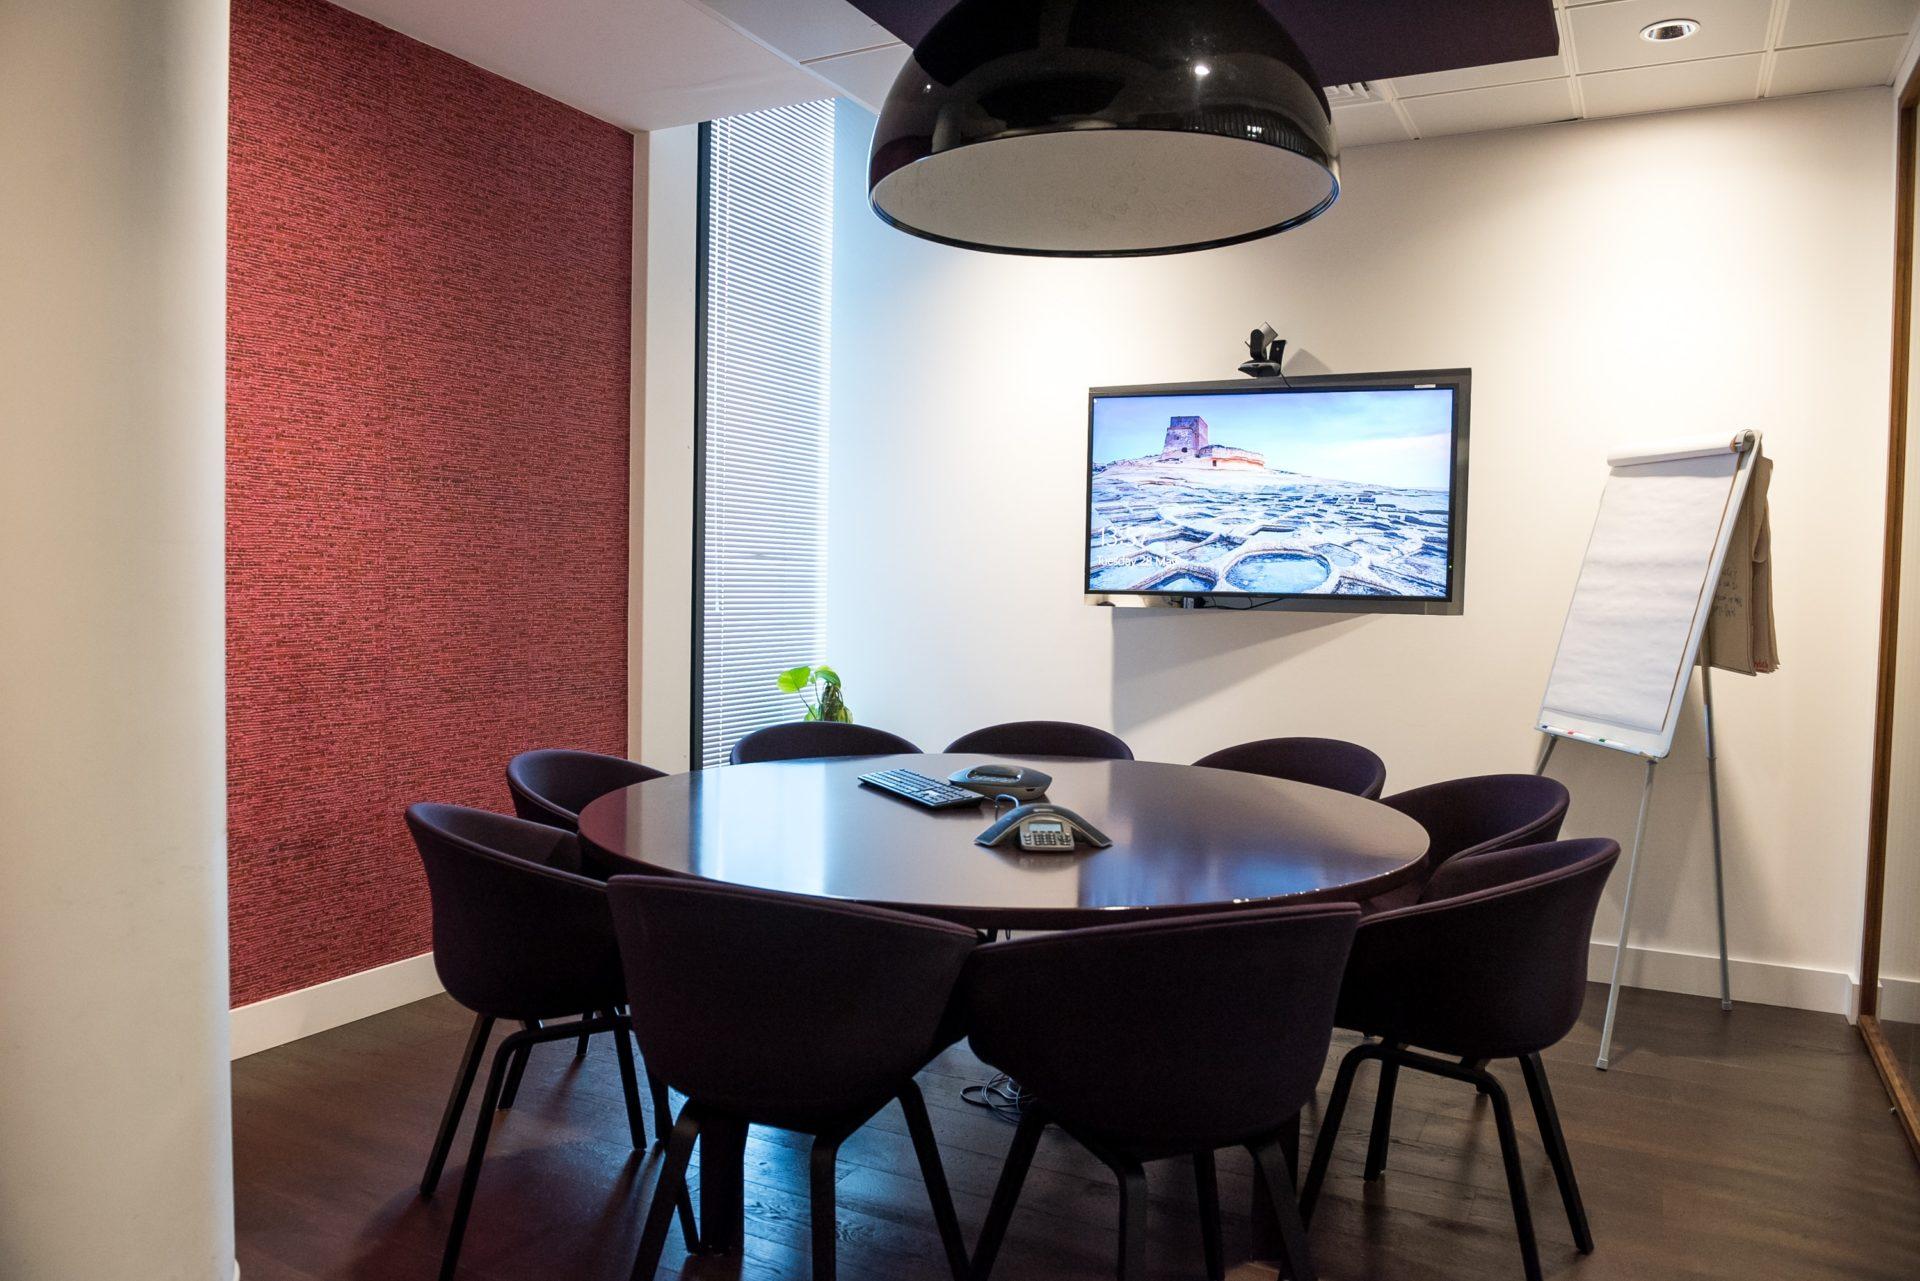 FutureTel image of office for blog